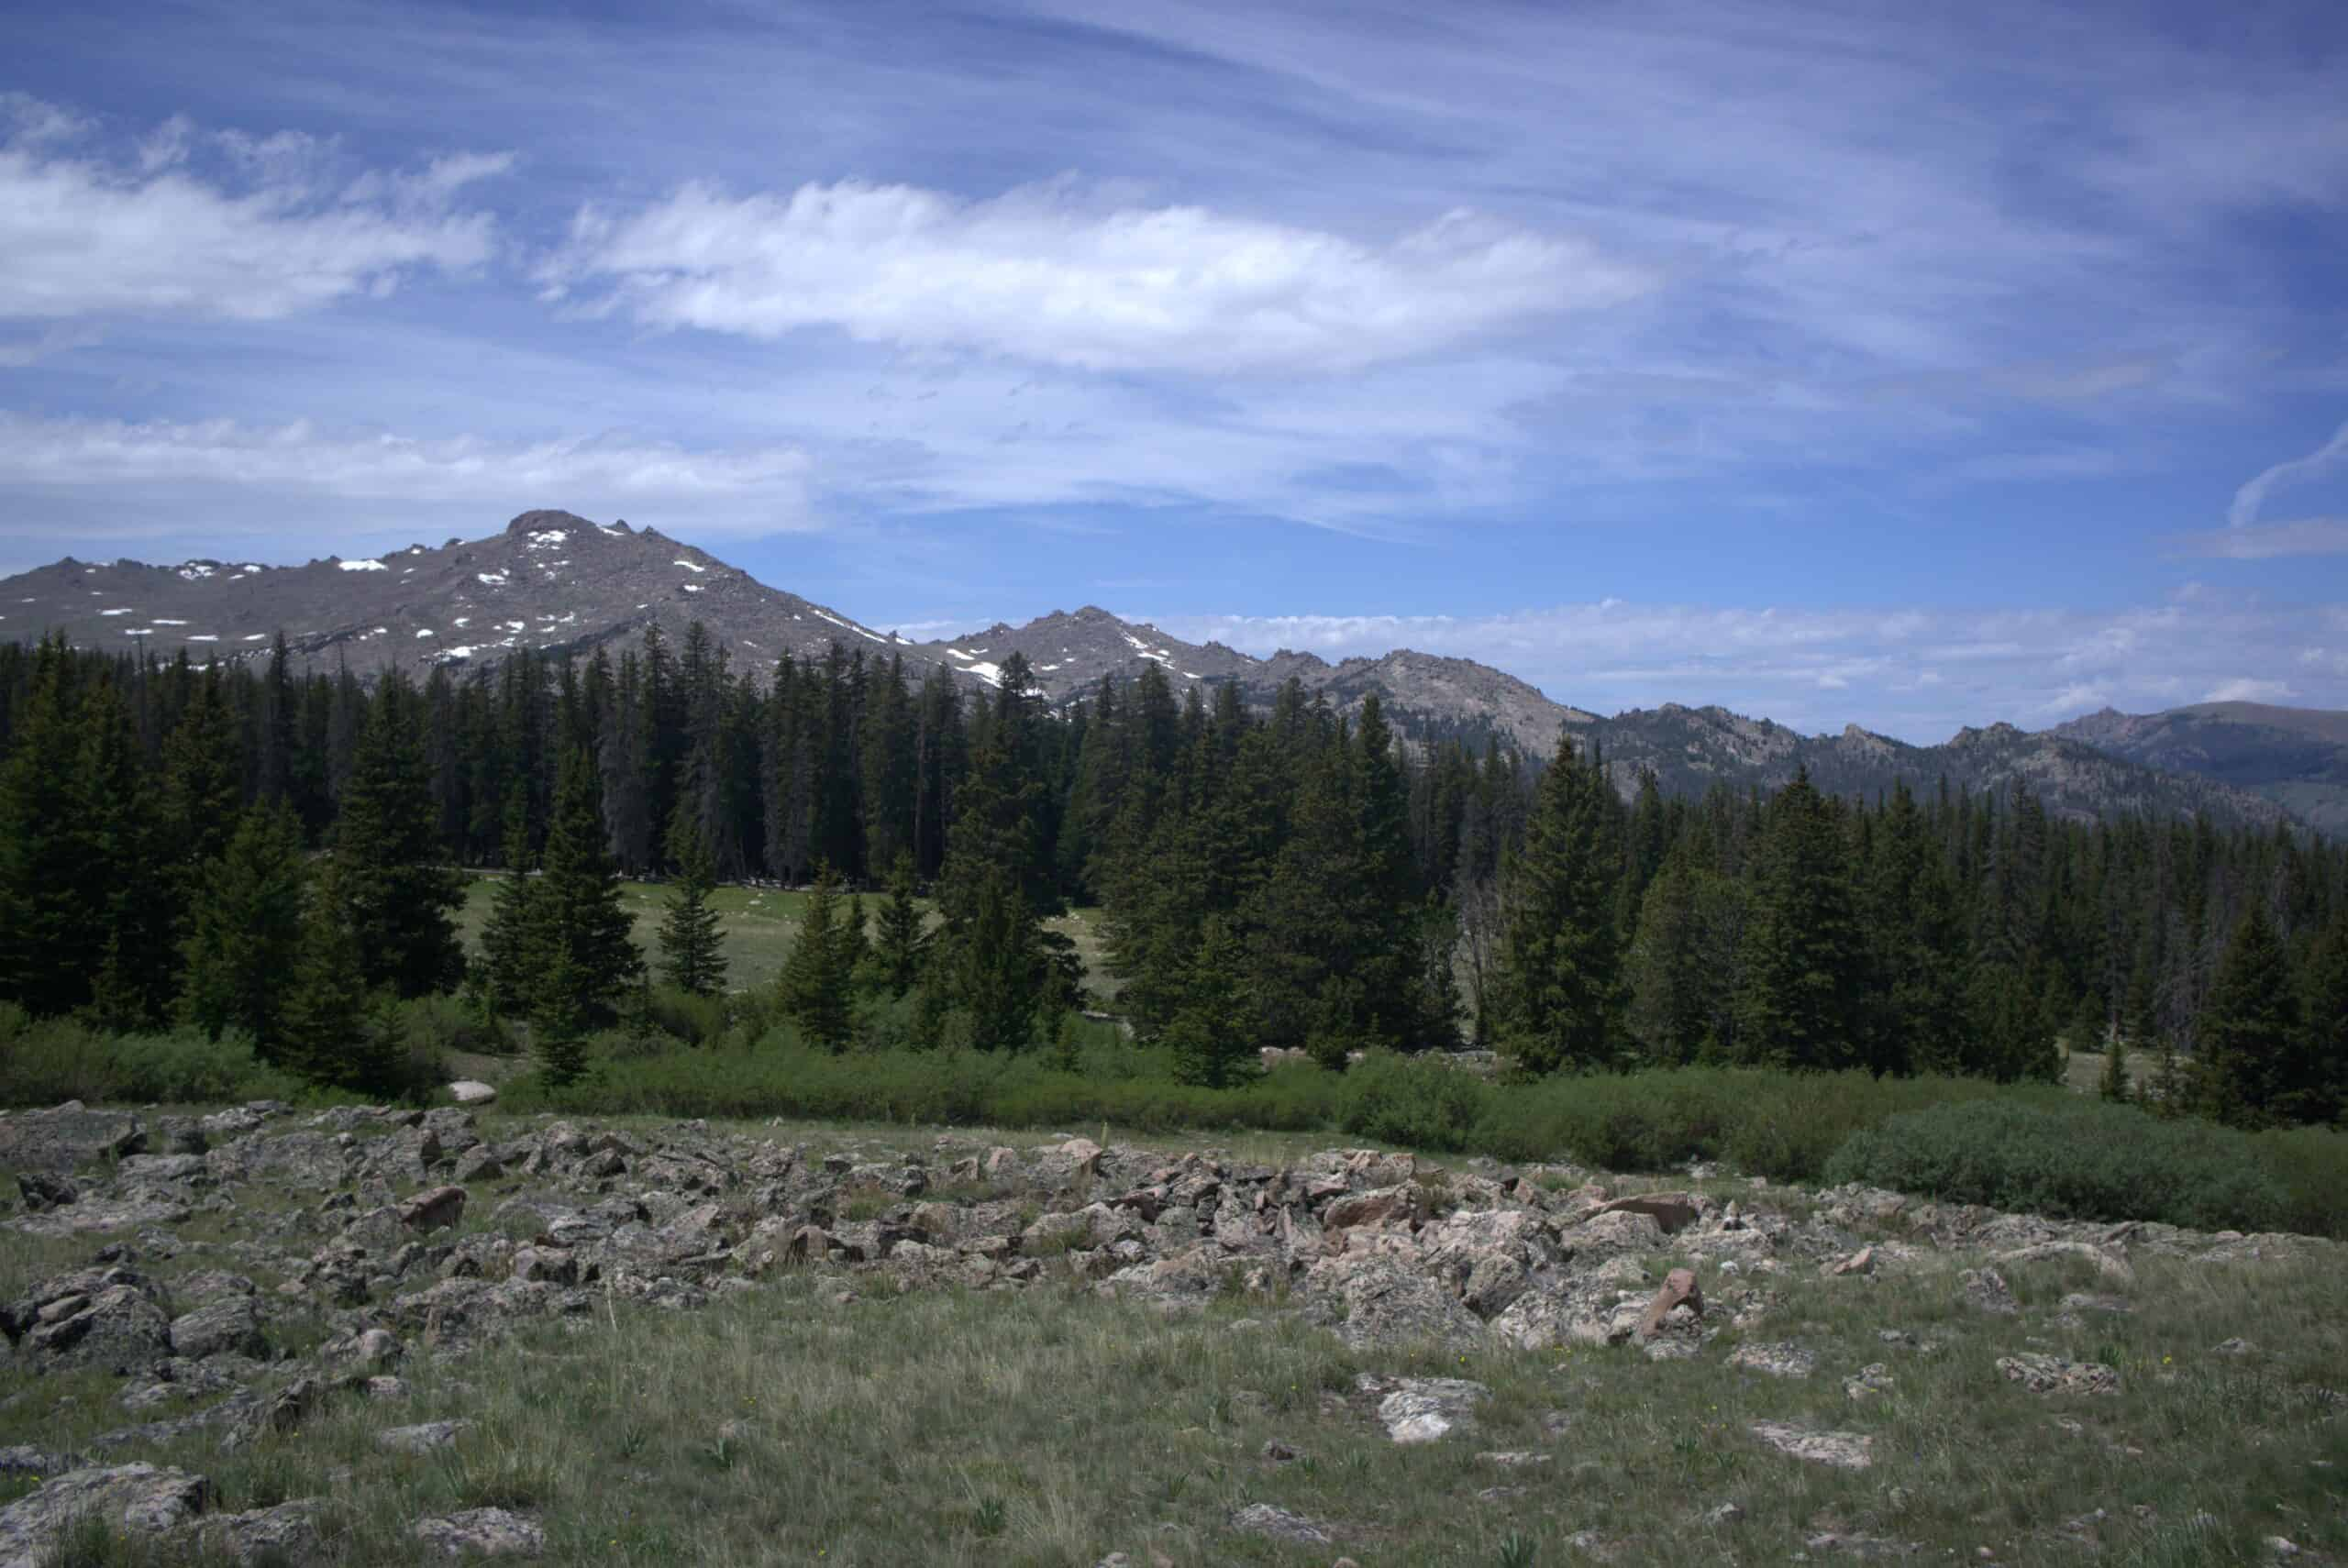 Hiking meadows rocks mountains trees